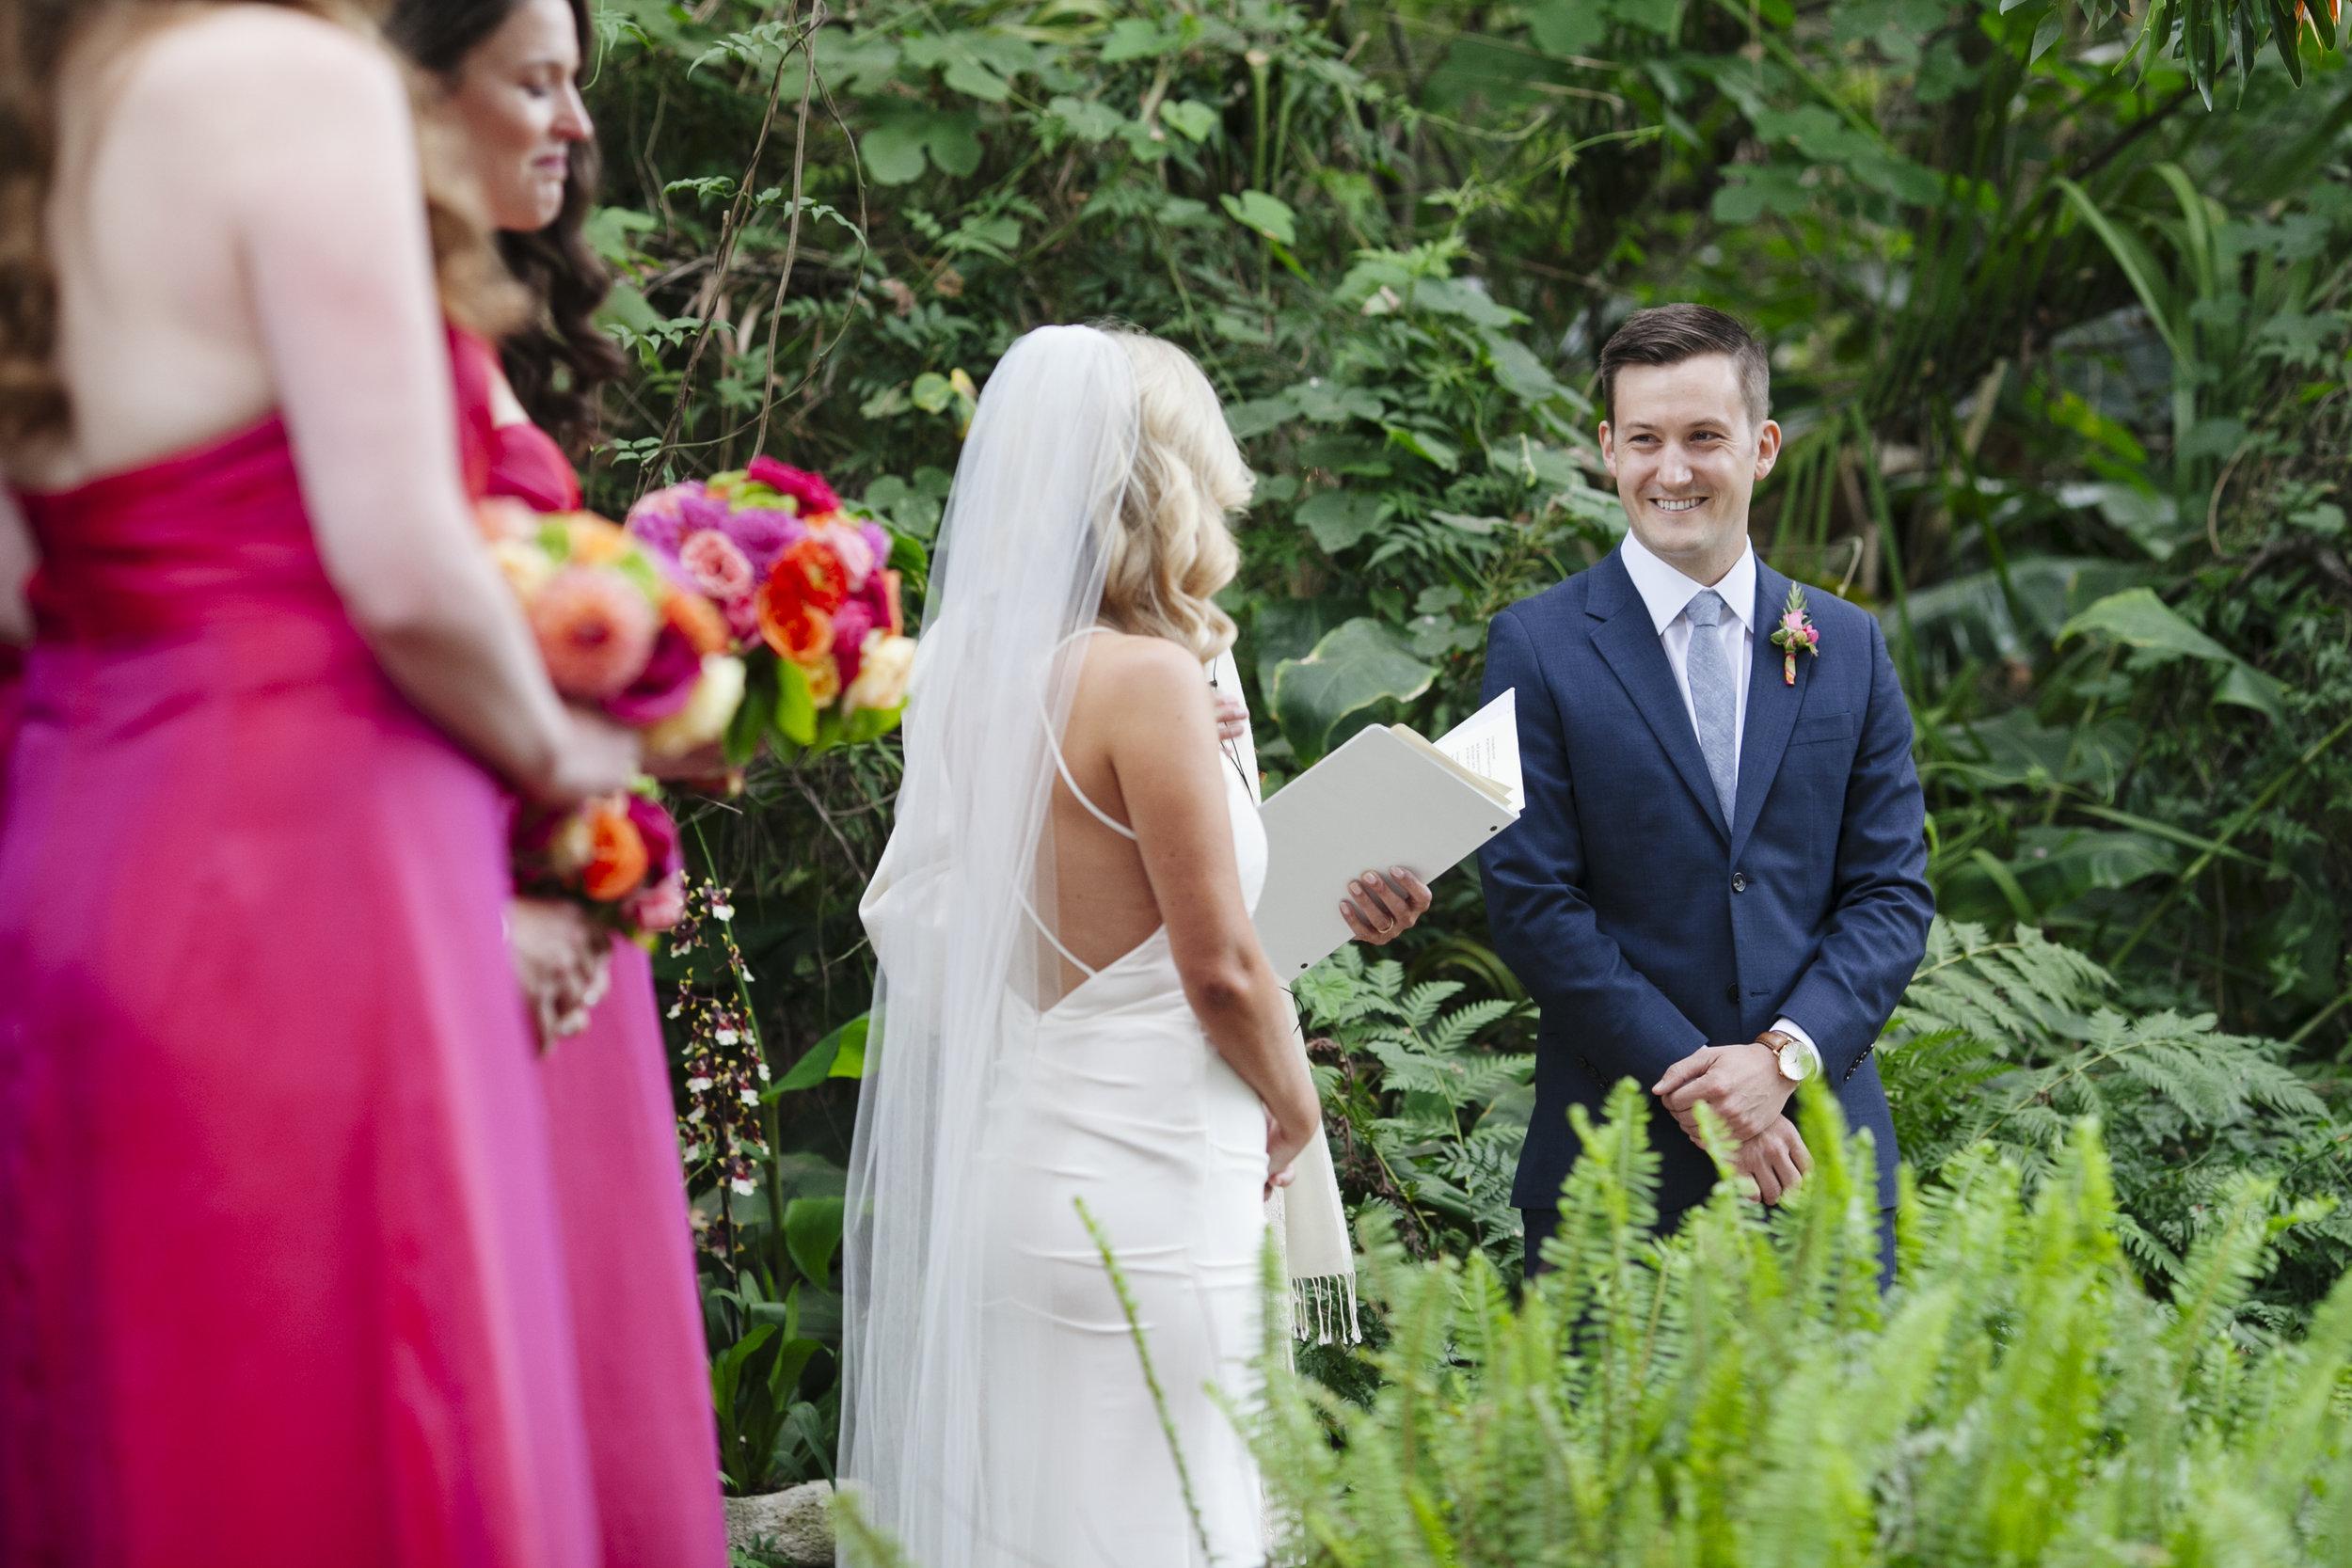 KateGarrett_WeddingPreview_MG_0434.jpg